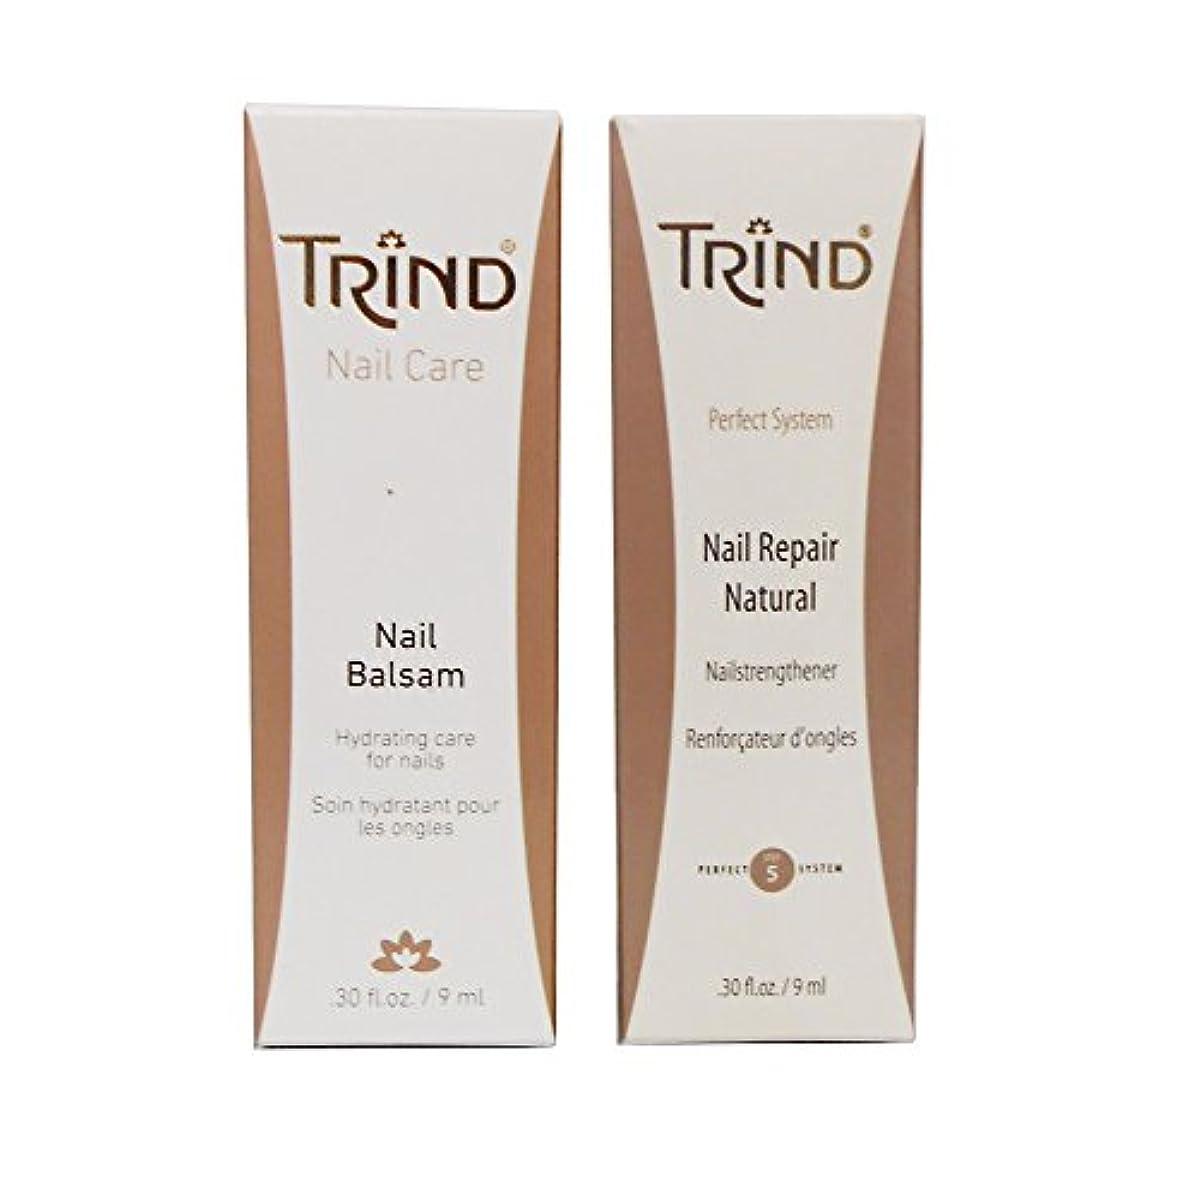 Trind Nail Balsam and Nail Repair Kit in Dubai - UAE  Whizz